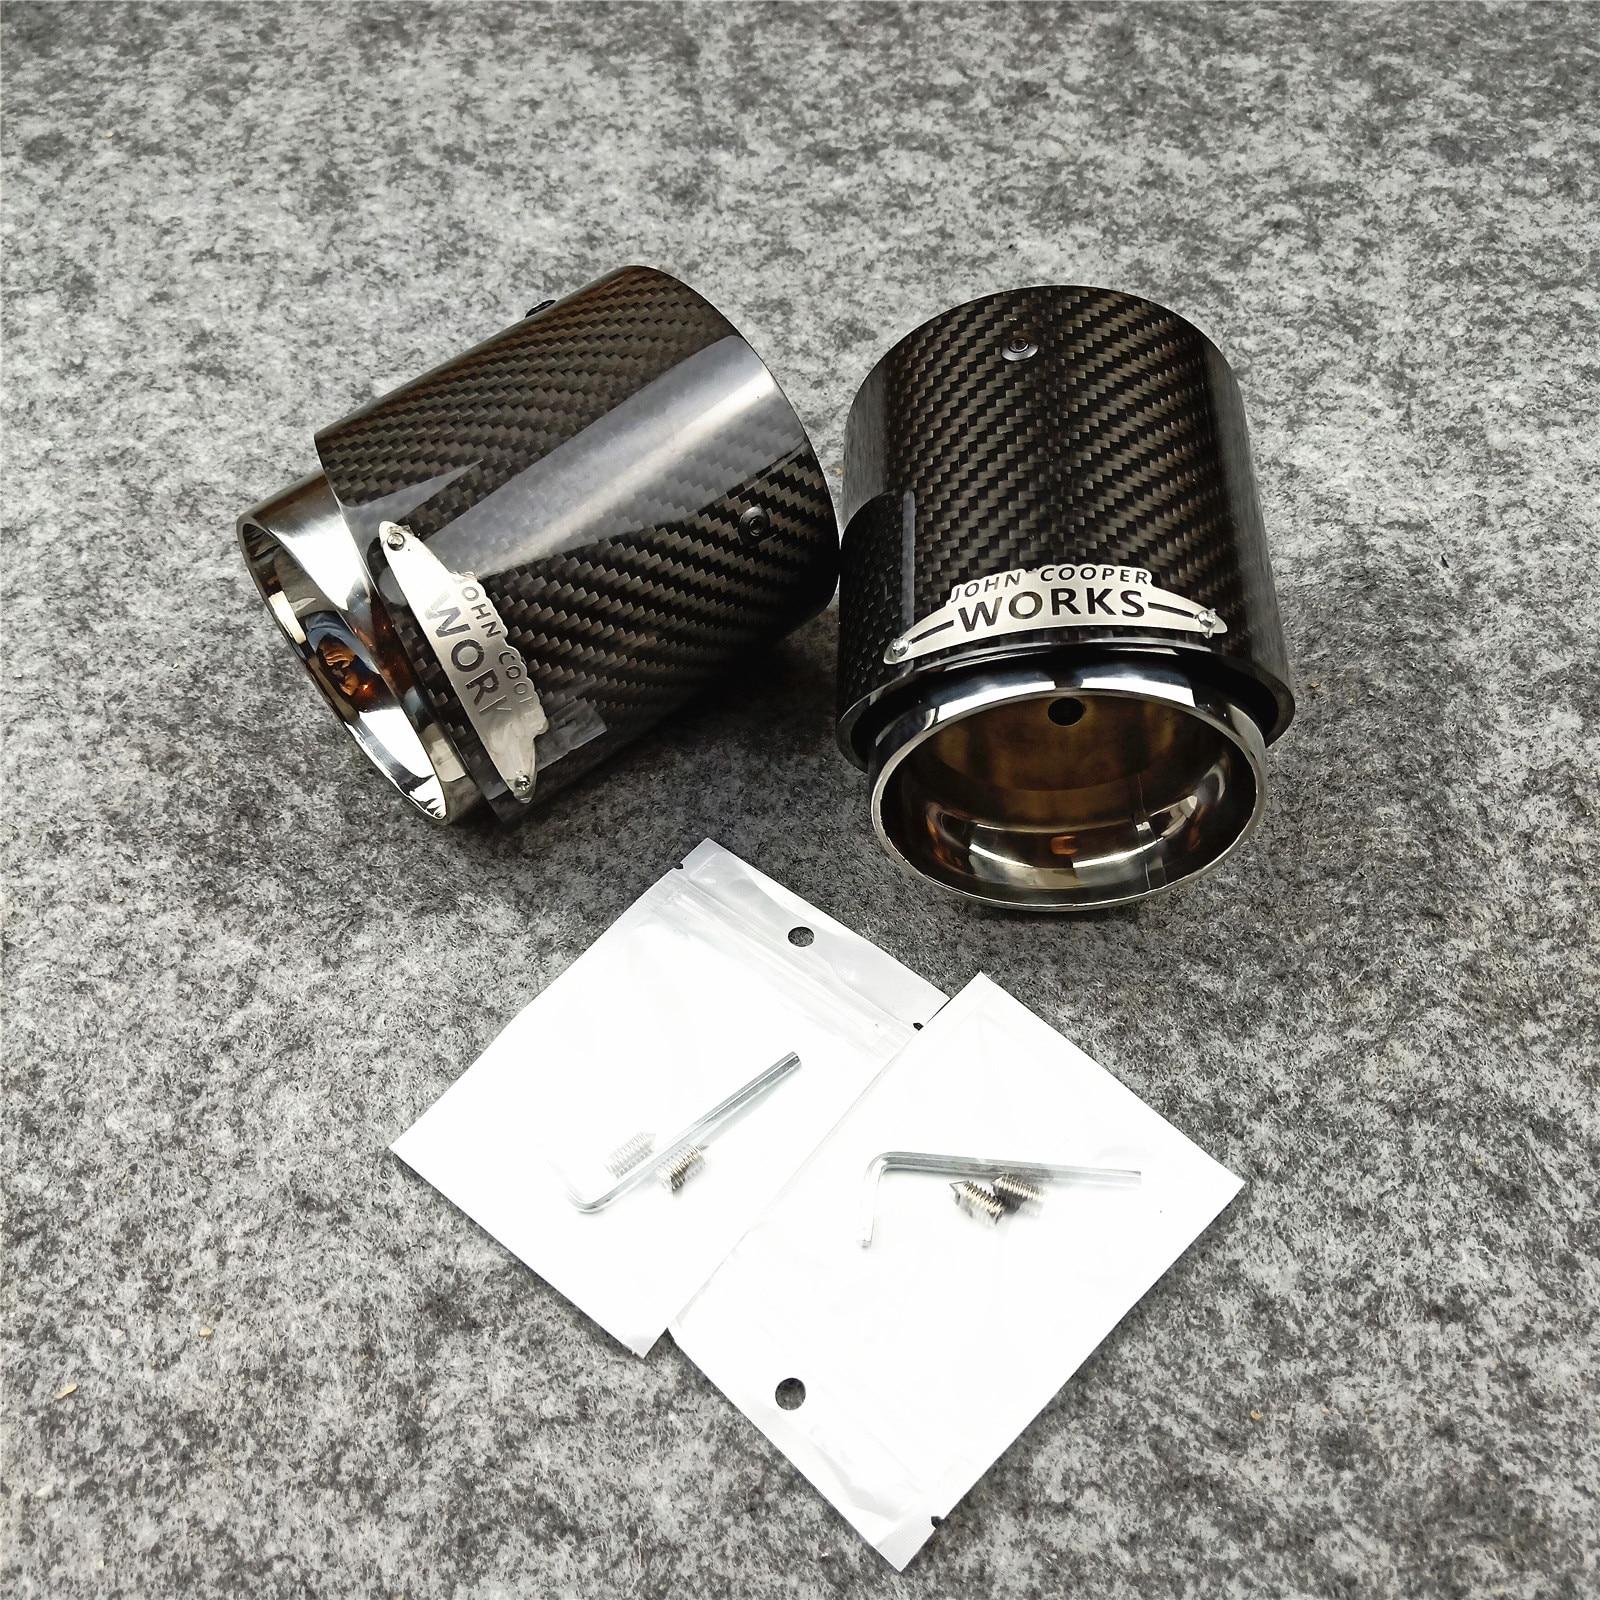 Image 3 - 1 PCS 3K Carbon Top Quality Exhaust Muffler Tips for MINI Cooper S  R55 R56 R57 R58 R59 R60 R61 F54 F56 F57 F60Exhaust